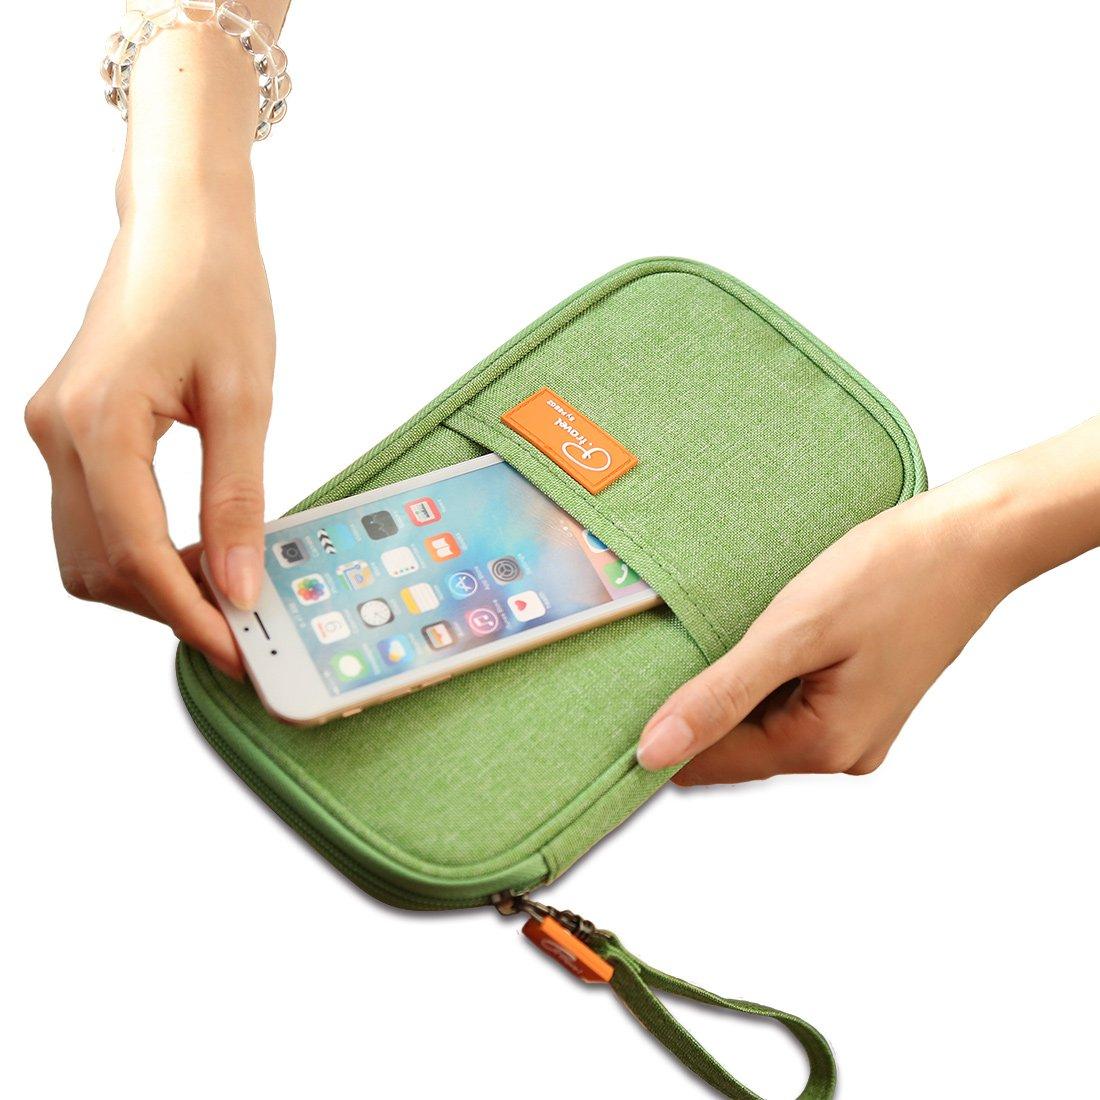 Family Passport Holder RFID Blocking Green Travel Wallet with Zip For Men & Women, SUSU Multiple Waterproof Card Case